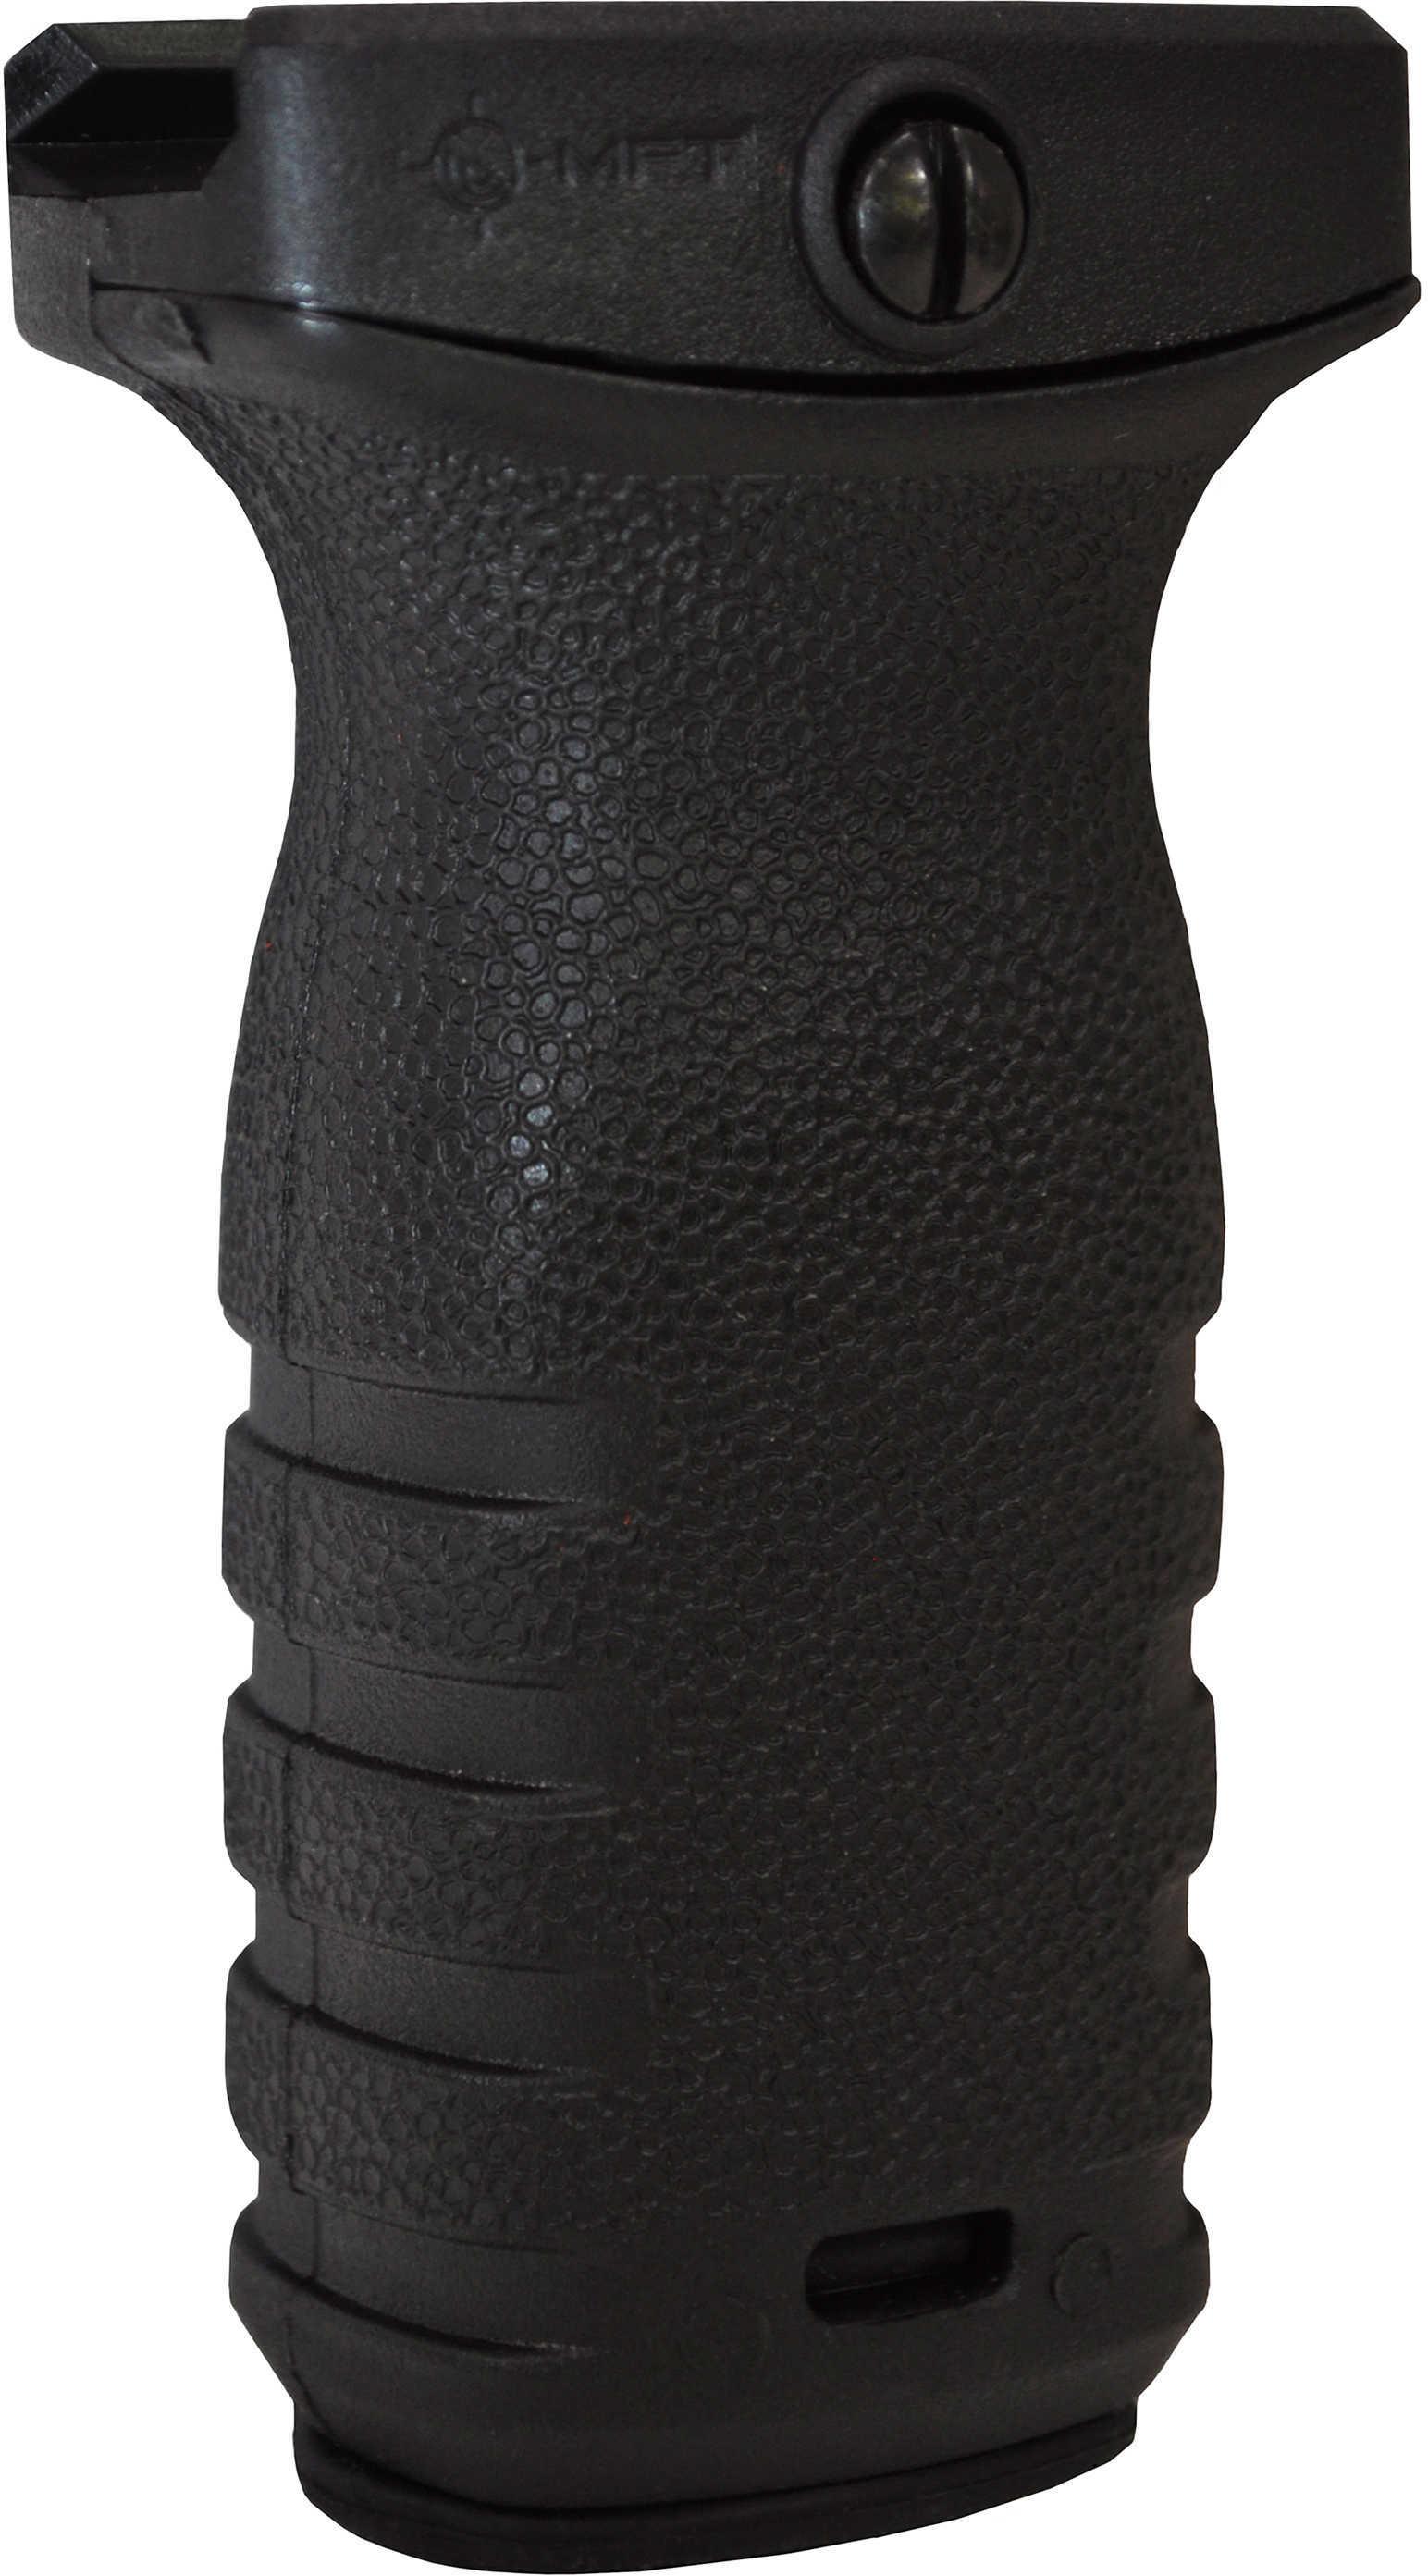 Remington Accessories Short Vertical Forward Grip Md: 93390